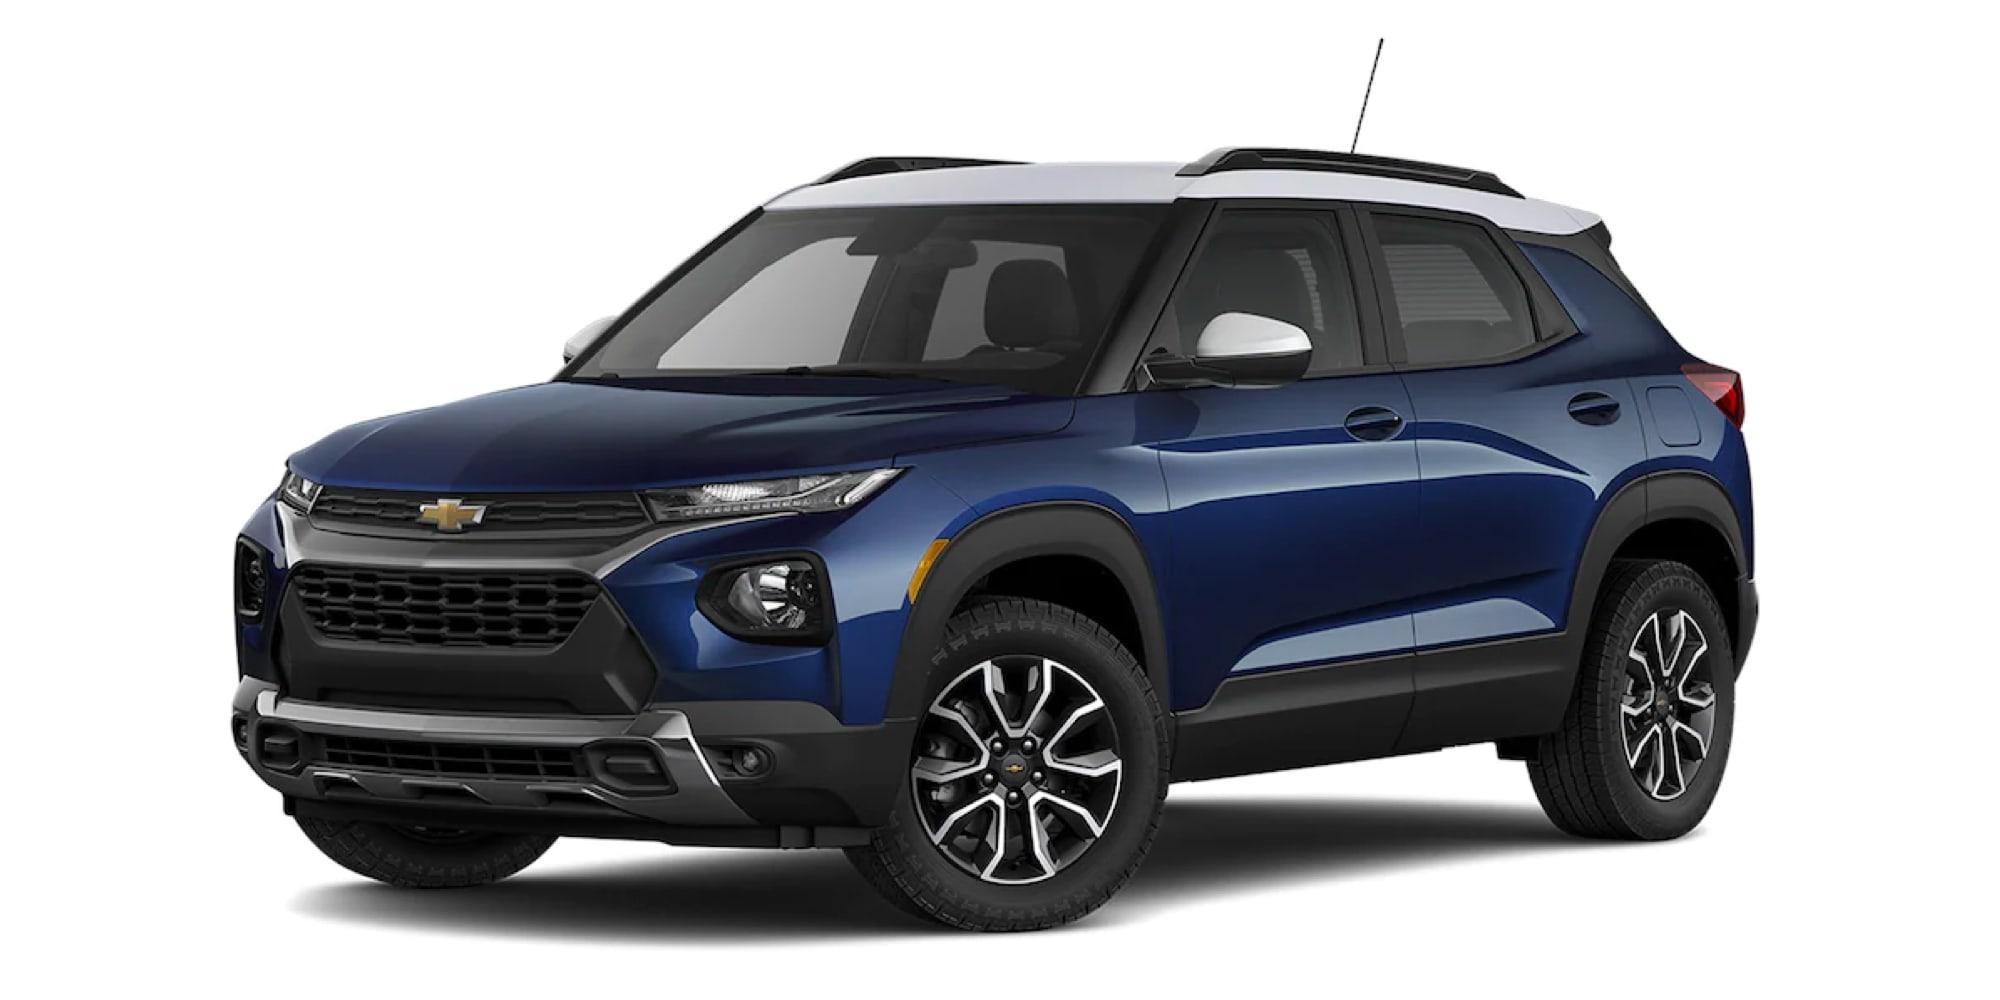 2022 Chevy Trailblazer in two-tone Blue Glow METALLIC / SUMMIT WHITE